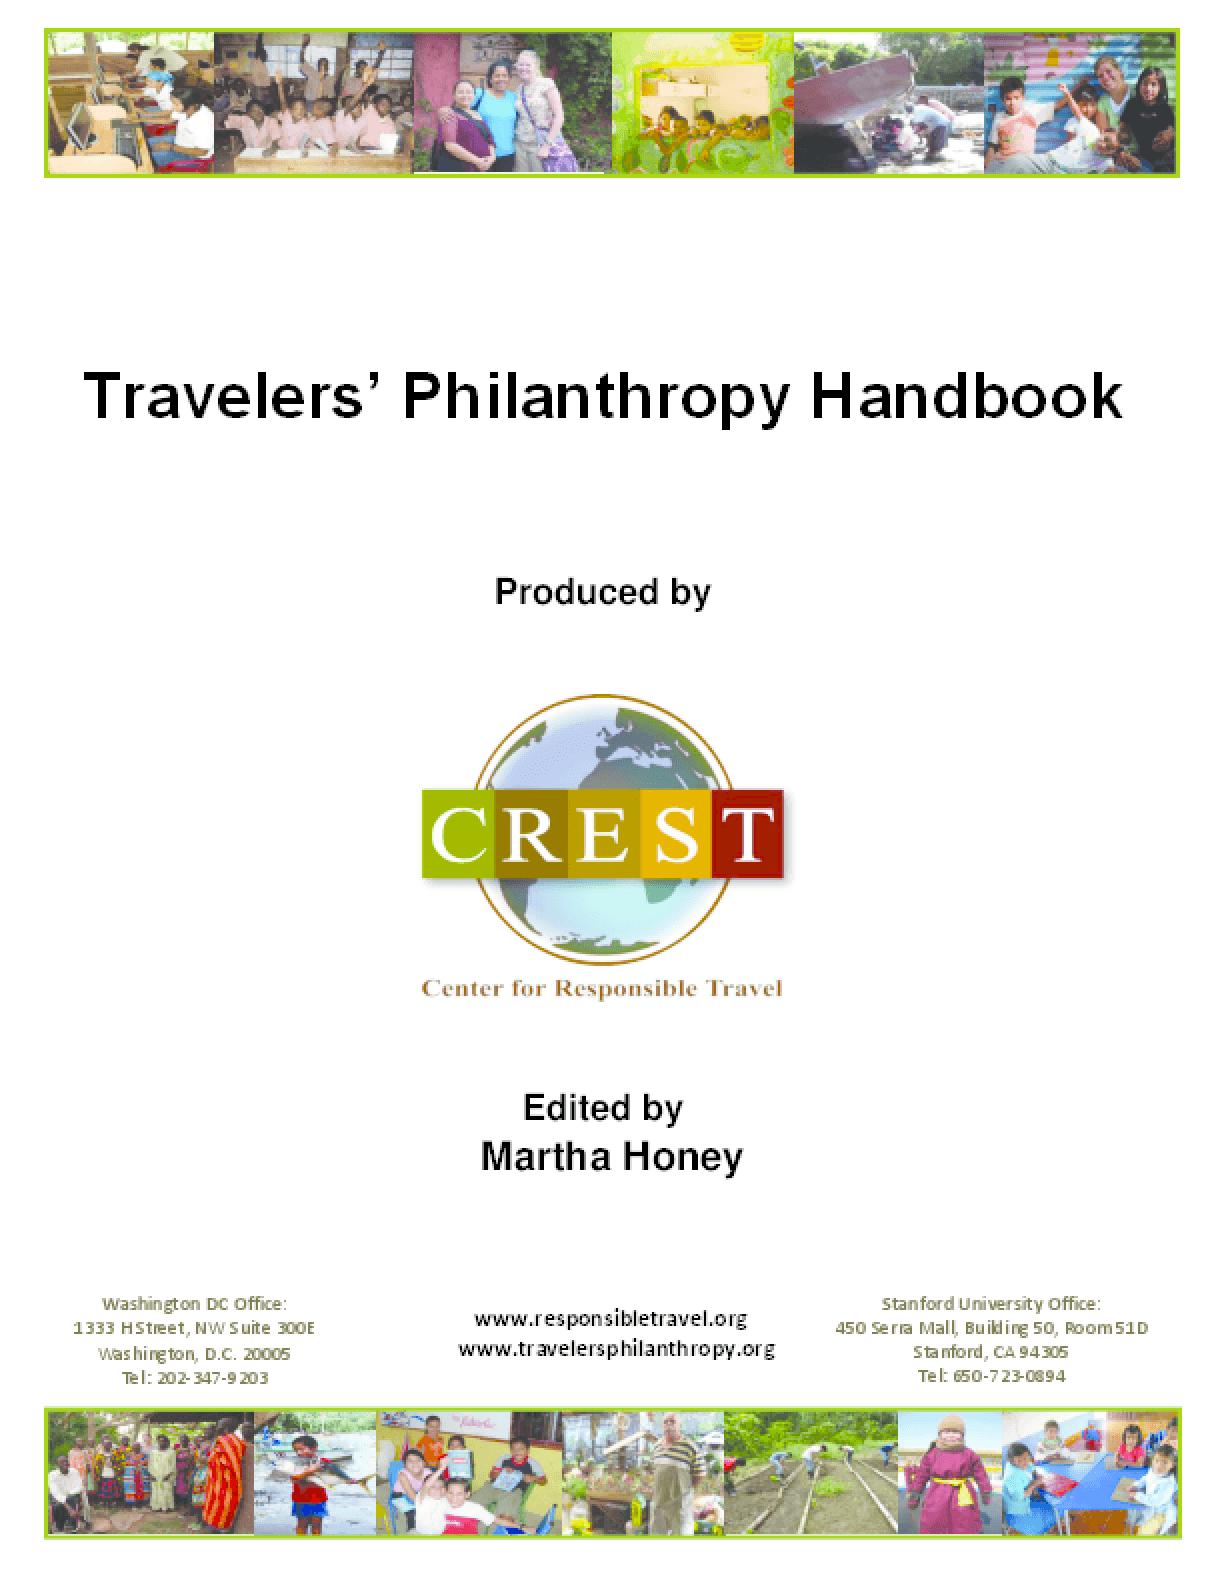 Travelers' Philanthropy Handbook